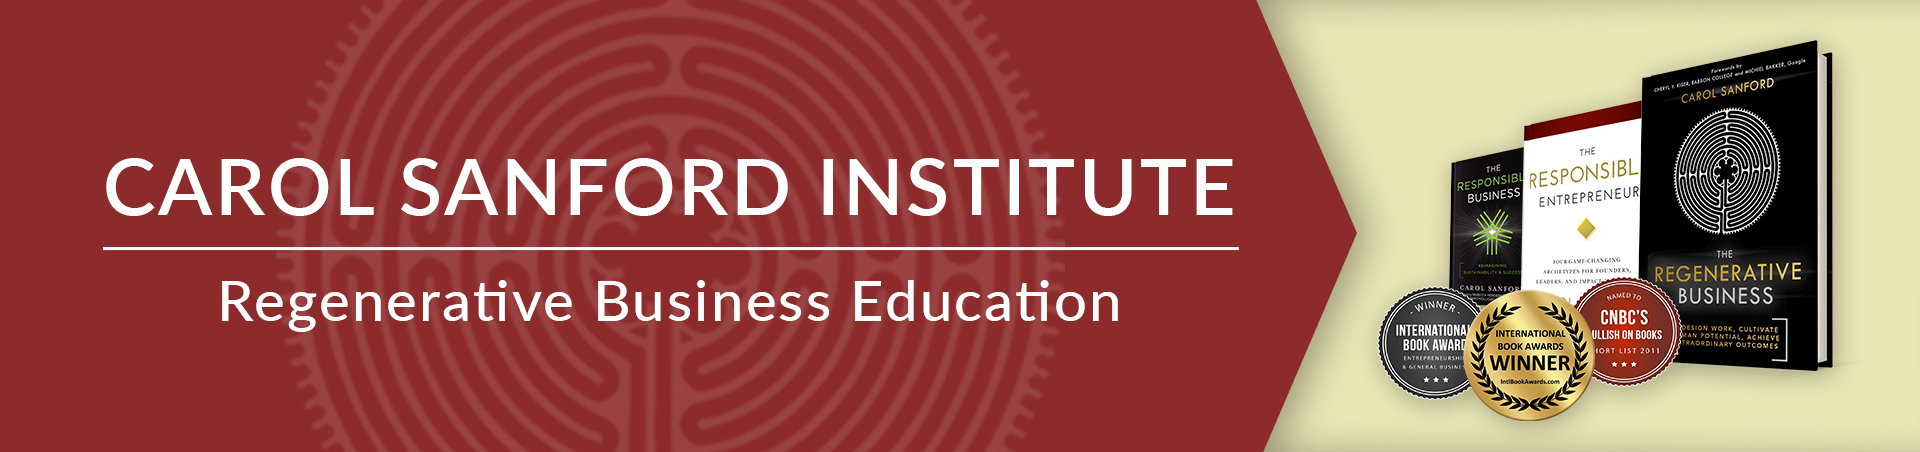 Carol Sanford Institute